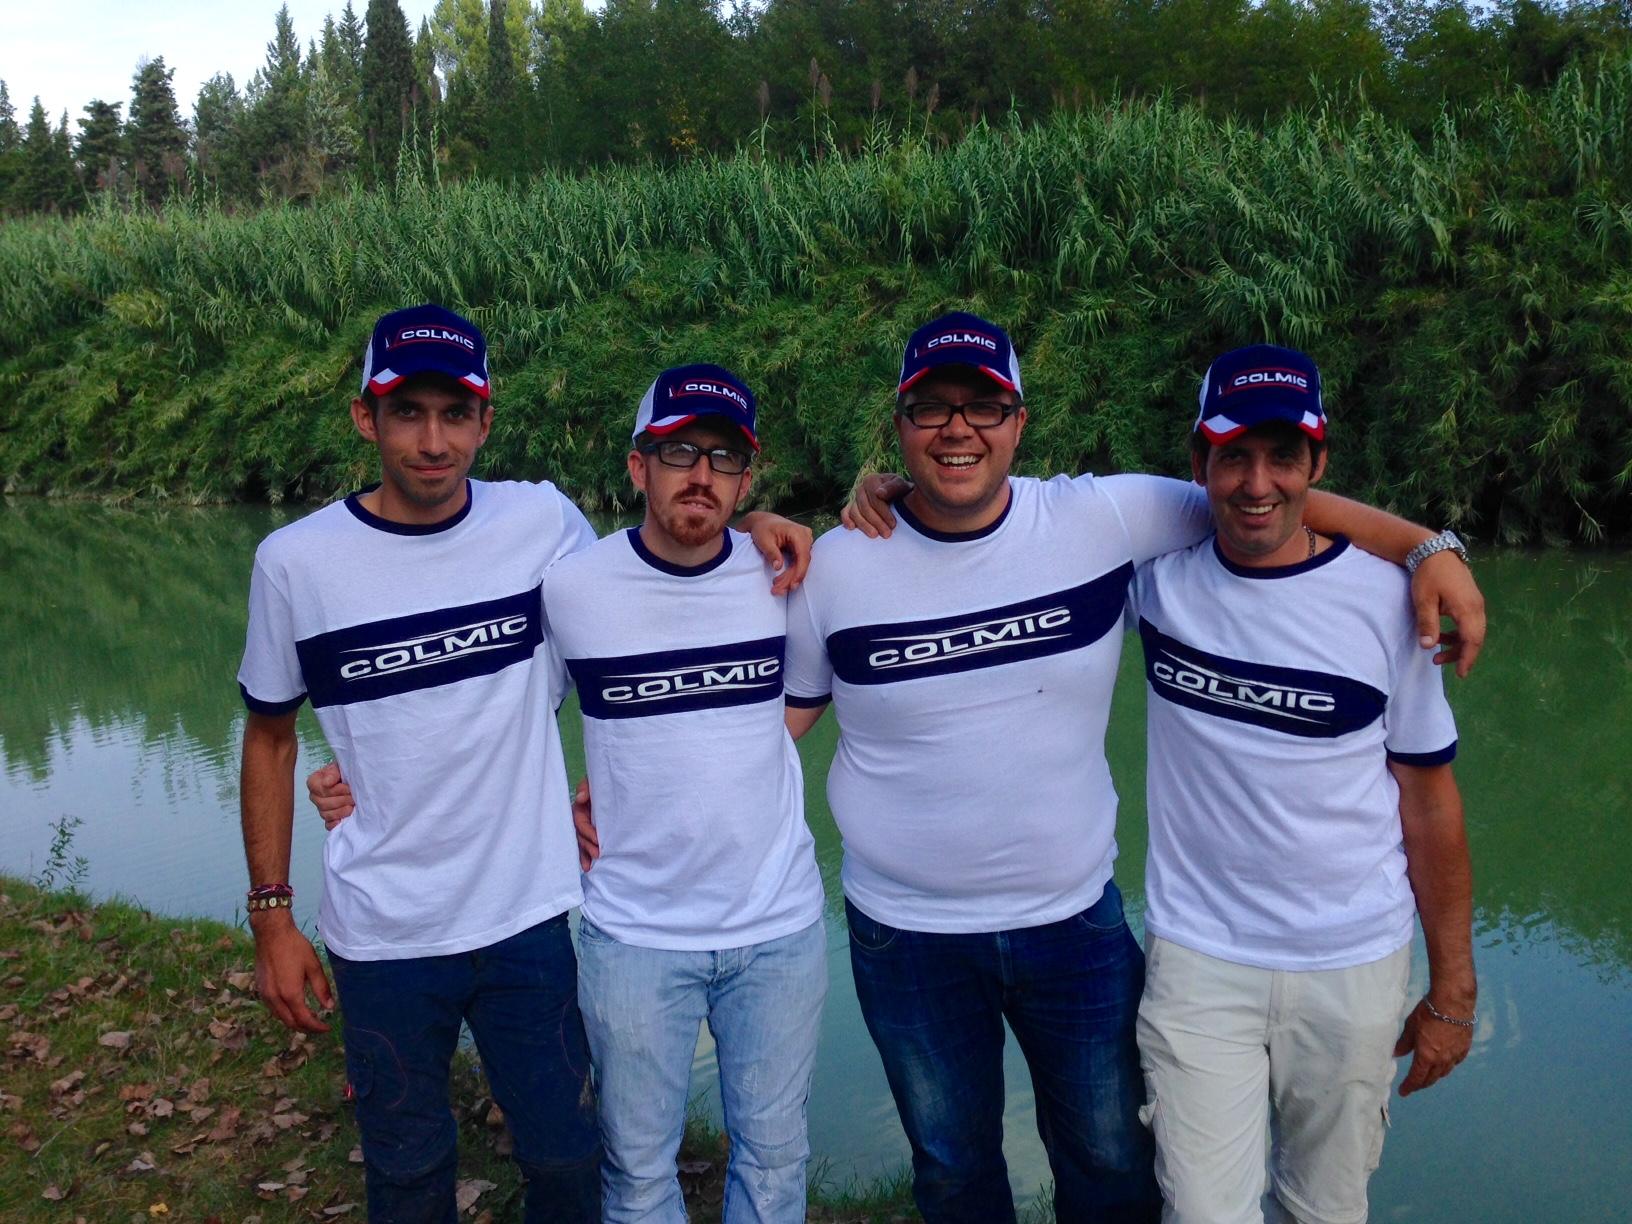 Valdelsa Colmic squadra masini 2014